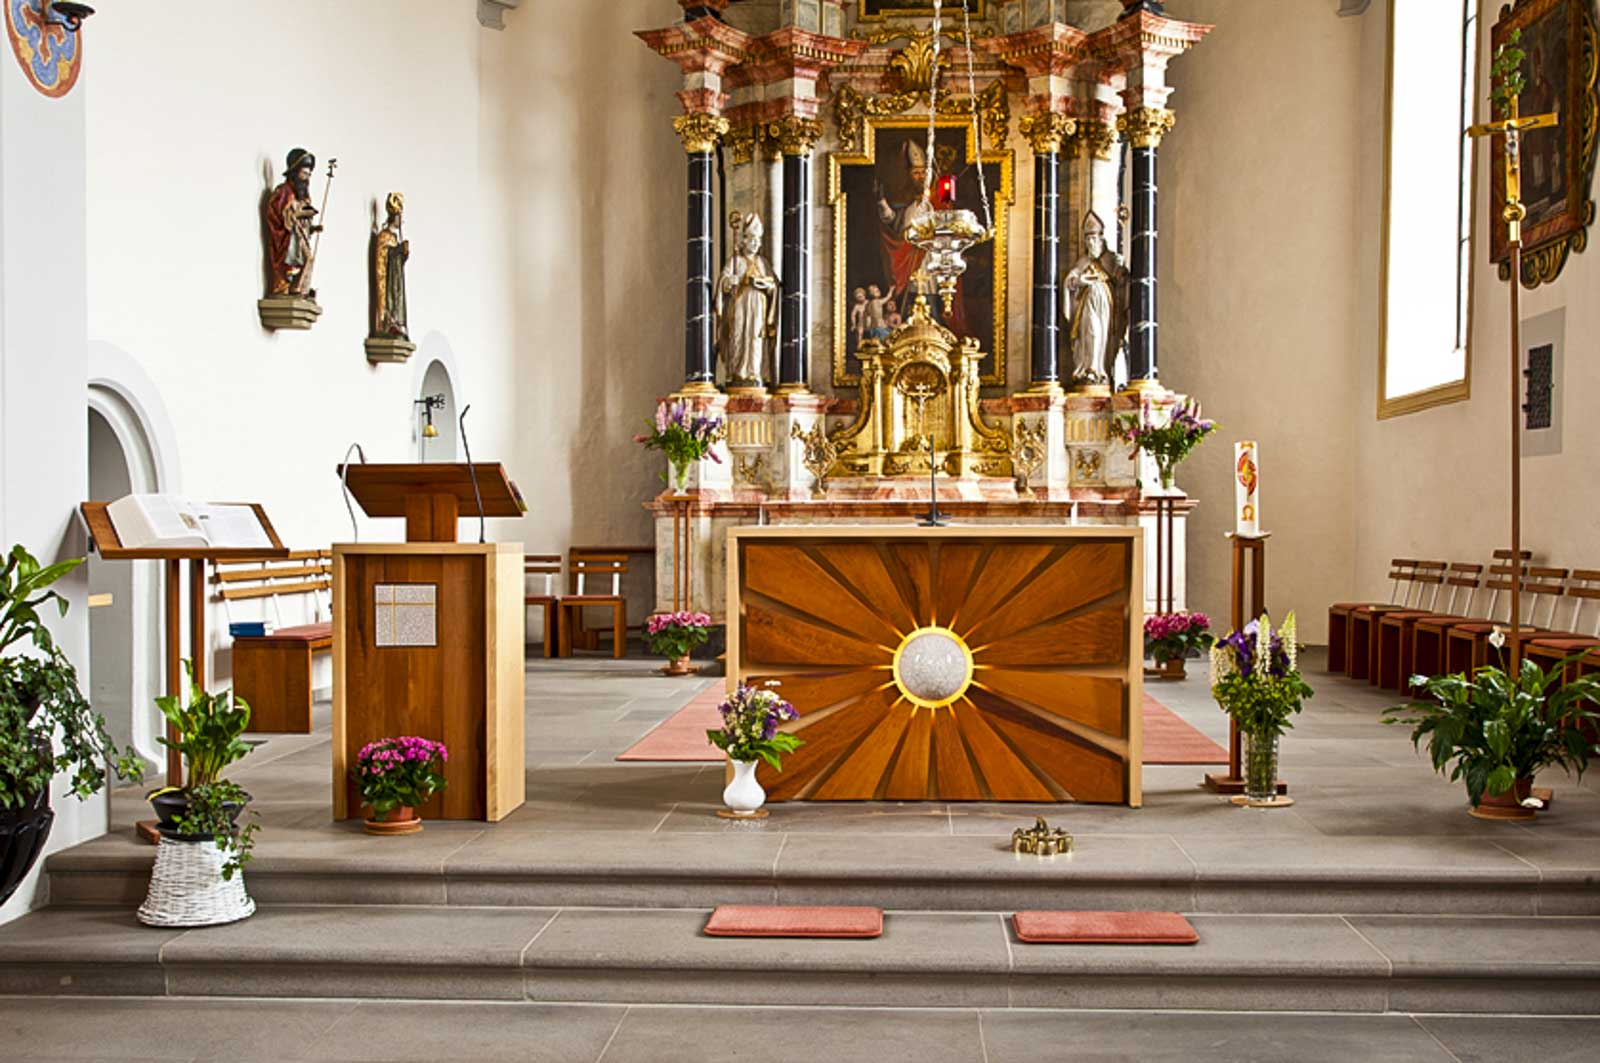 Woodesign_öffentliche Bauten_Kirchenmöbel_Altar_Ambos_Stühle_Osterkerze_Massivholz_Ahorn_Birnbaum_Raku_Kirche Rechthalten (1)